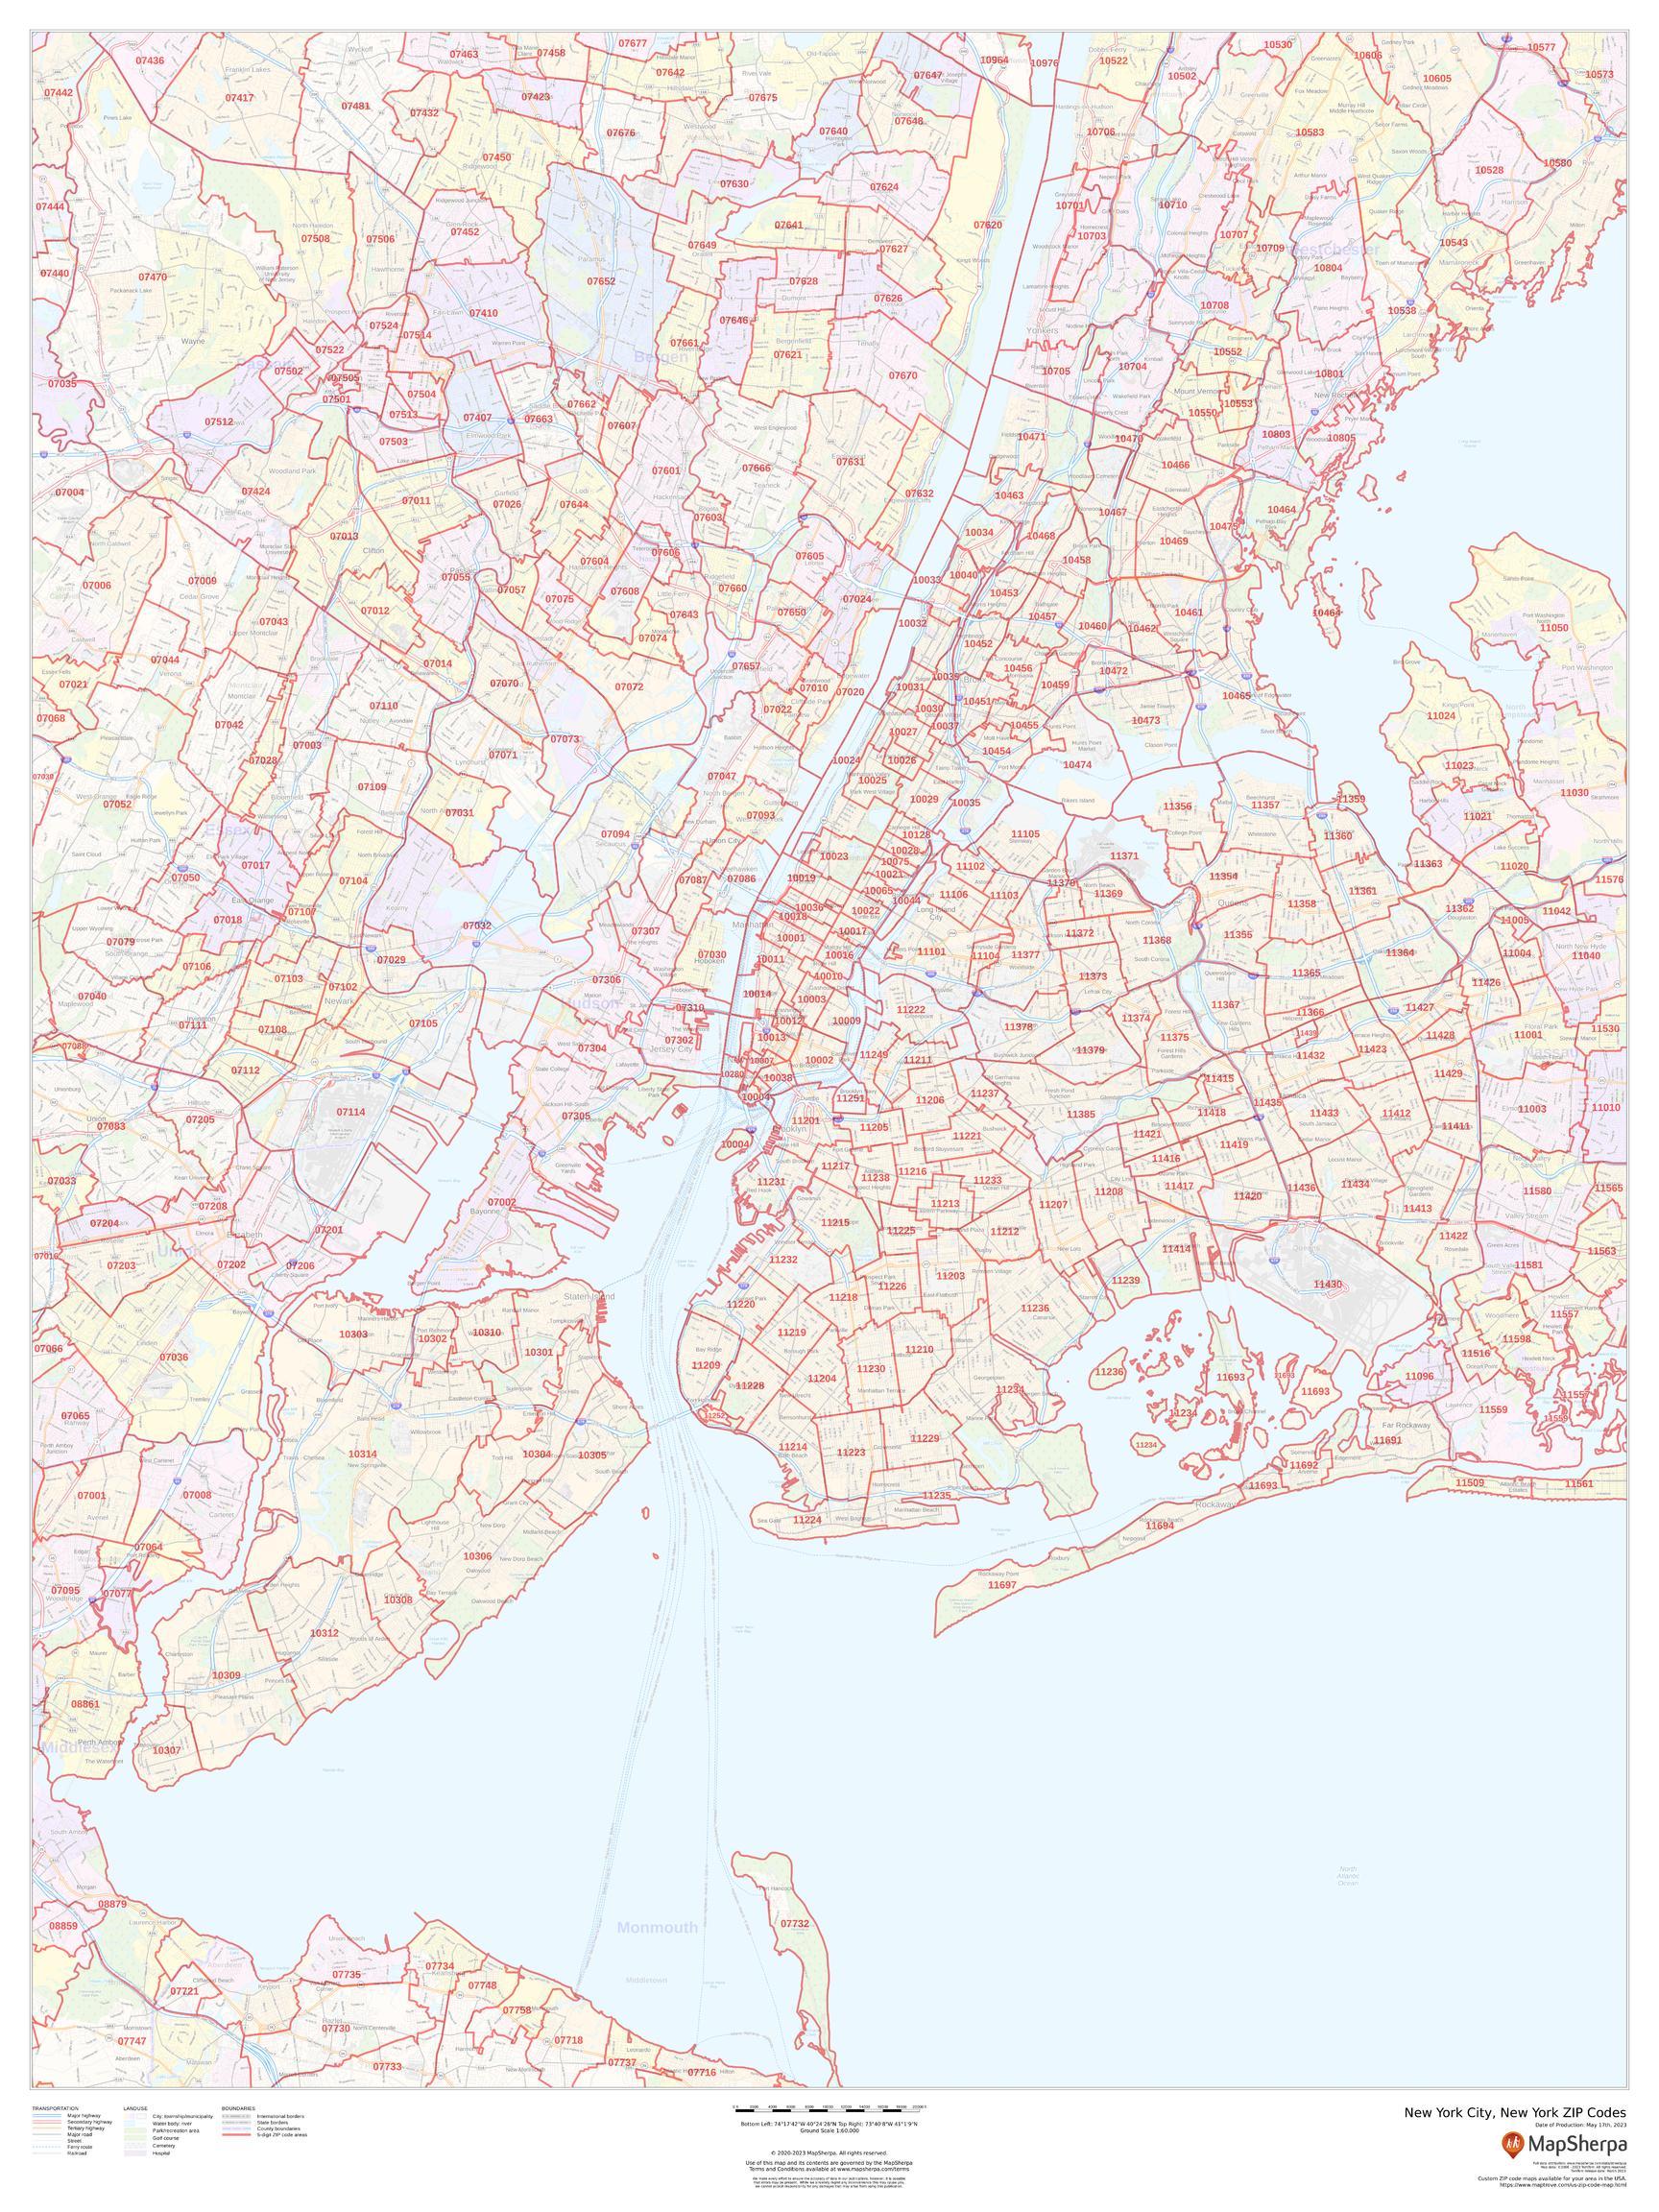 New York City, New York ZIP Codes Zip Code Map Of New York City on map of new york city police precincts, map of new york city schools, map of new york city hotels, map of new york city council districts, map with zip and city of brooklyn, map of new york city county, brooklyn new york zip codes, map of new york city weather, map of new york city street names, map of new york city state, nyc zip codes,